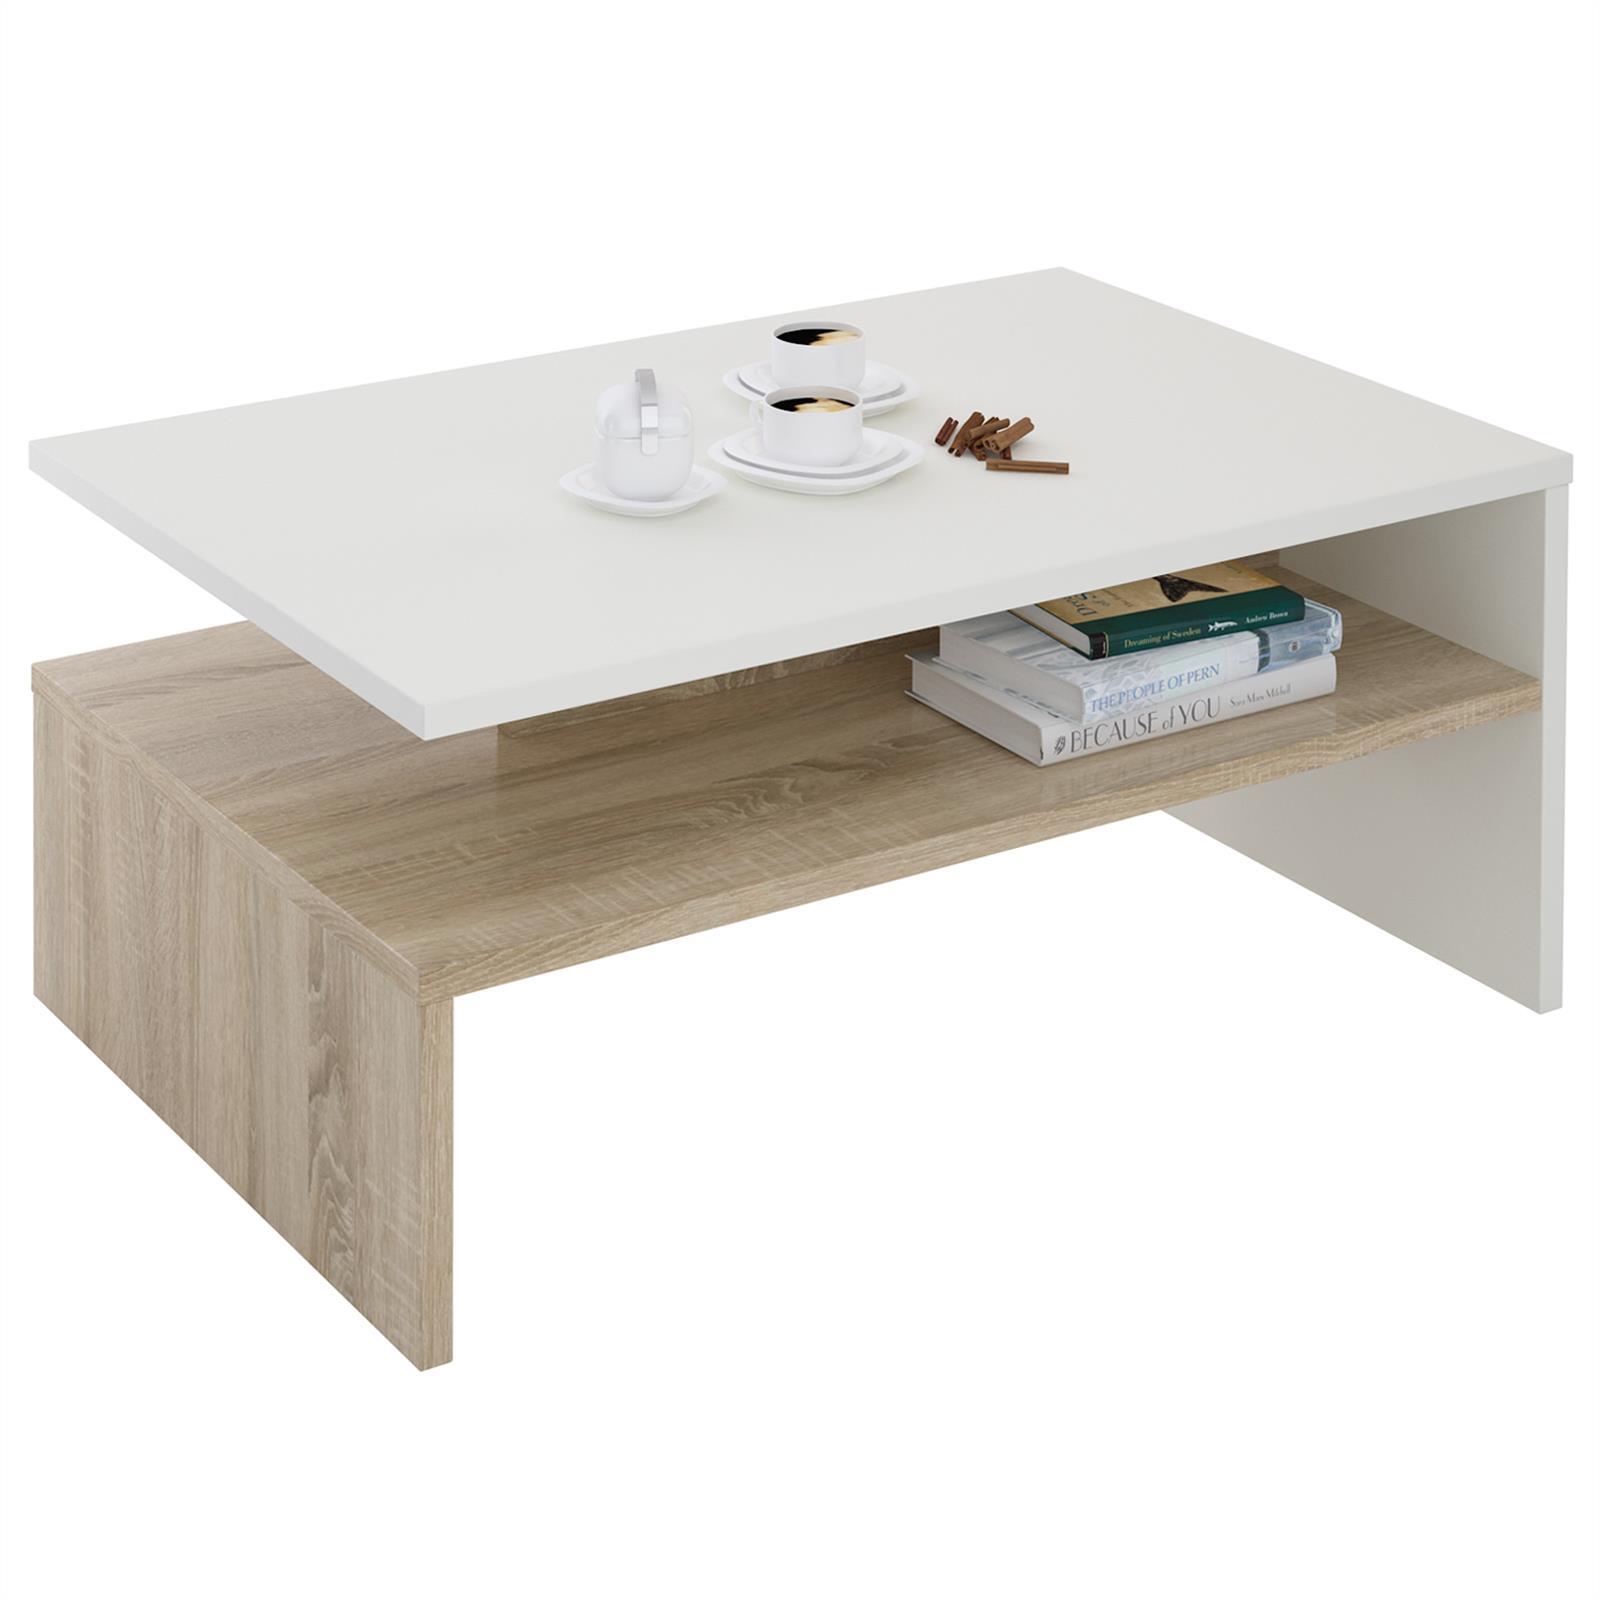 table basse adelaide en m lamin blanc mat et d cor ch ne. Black Bedroom Furniture Sets. Home Design Ideas